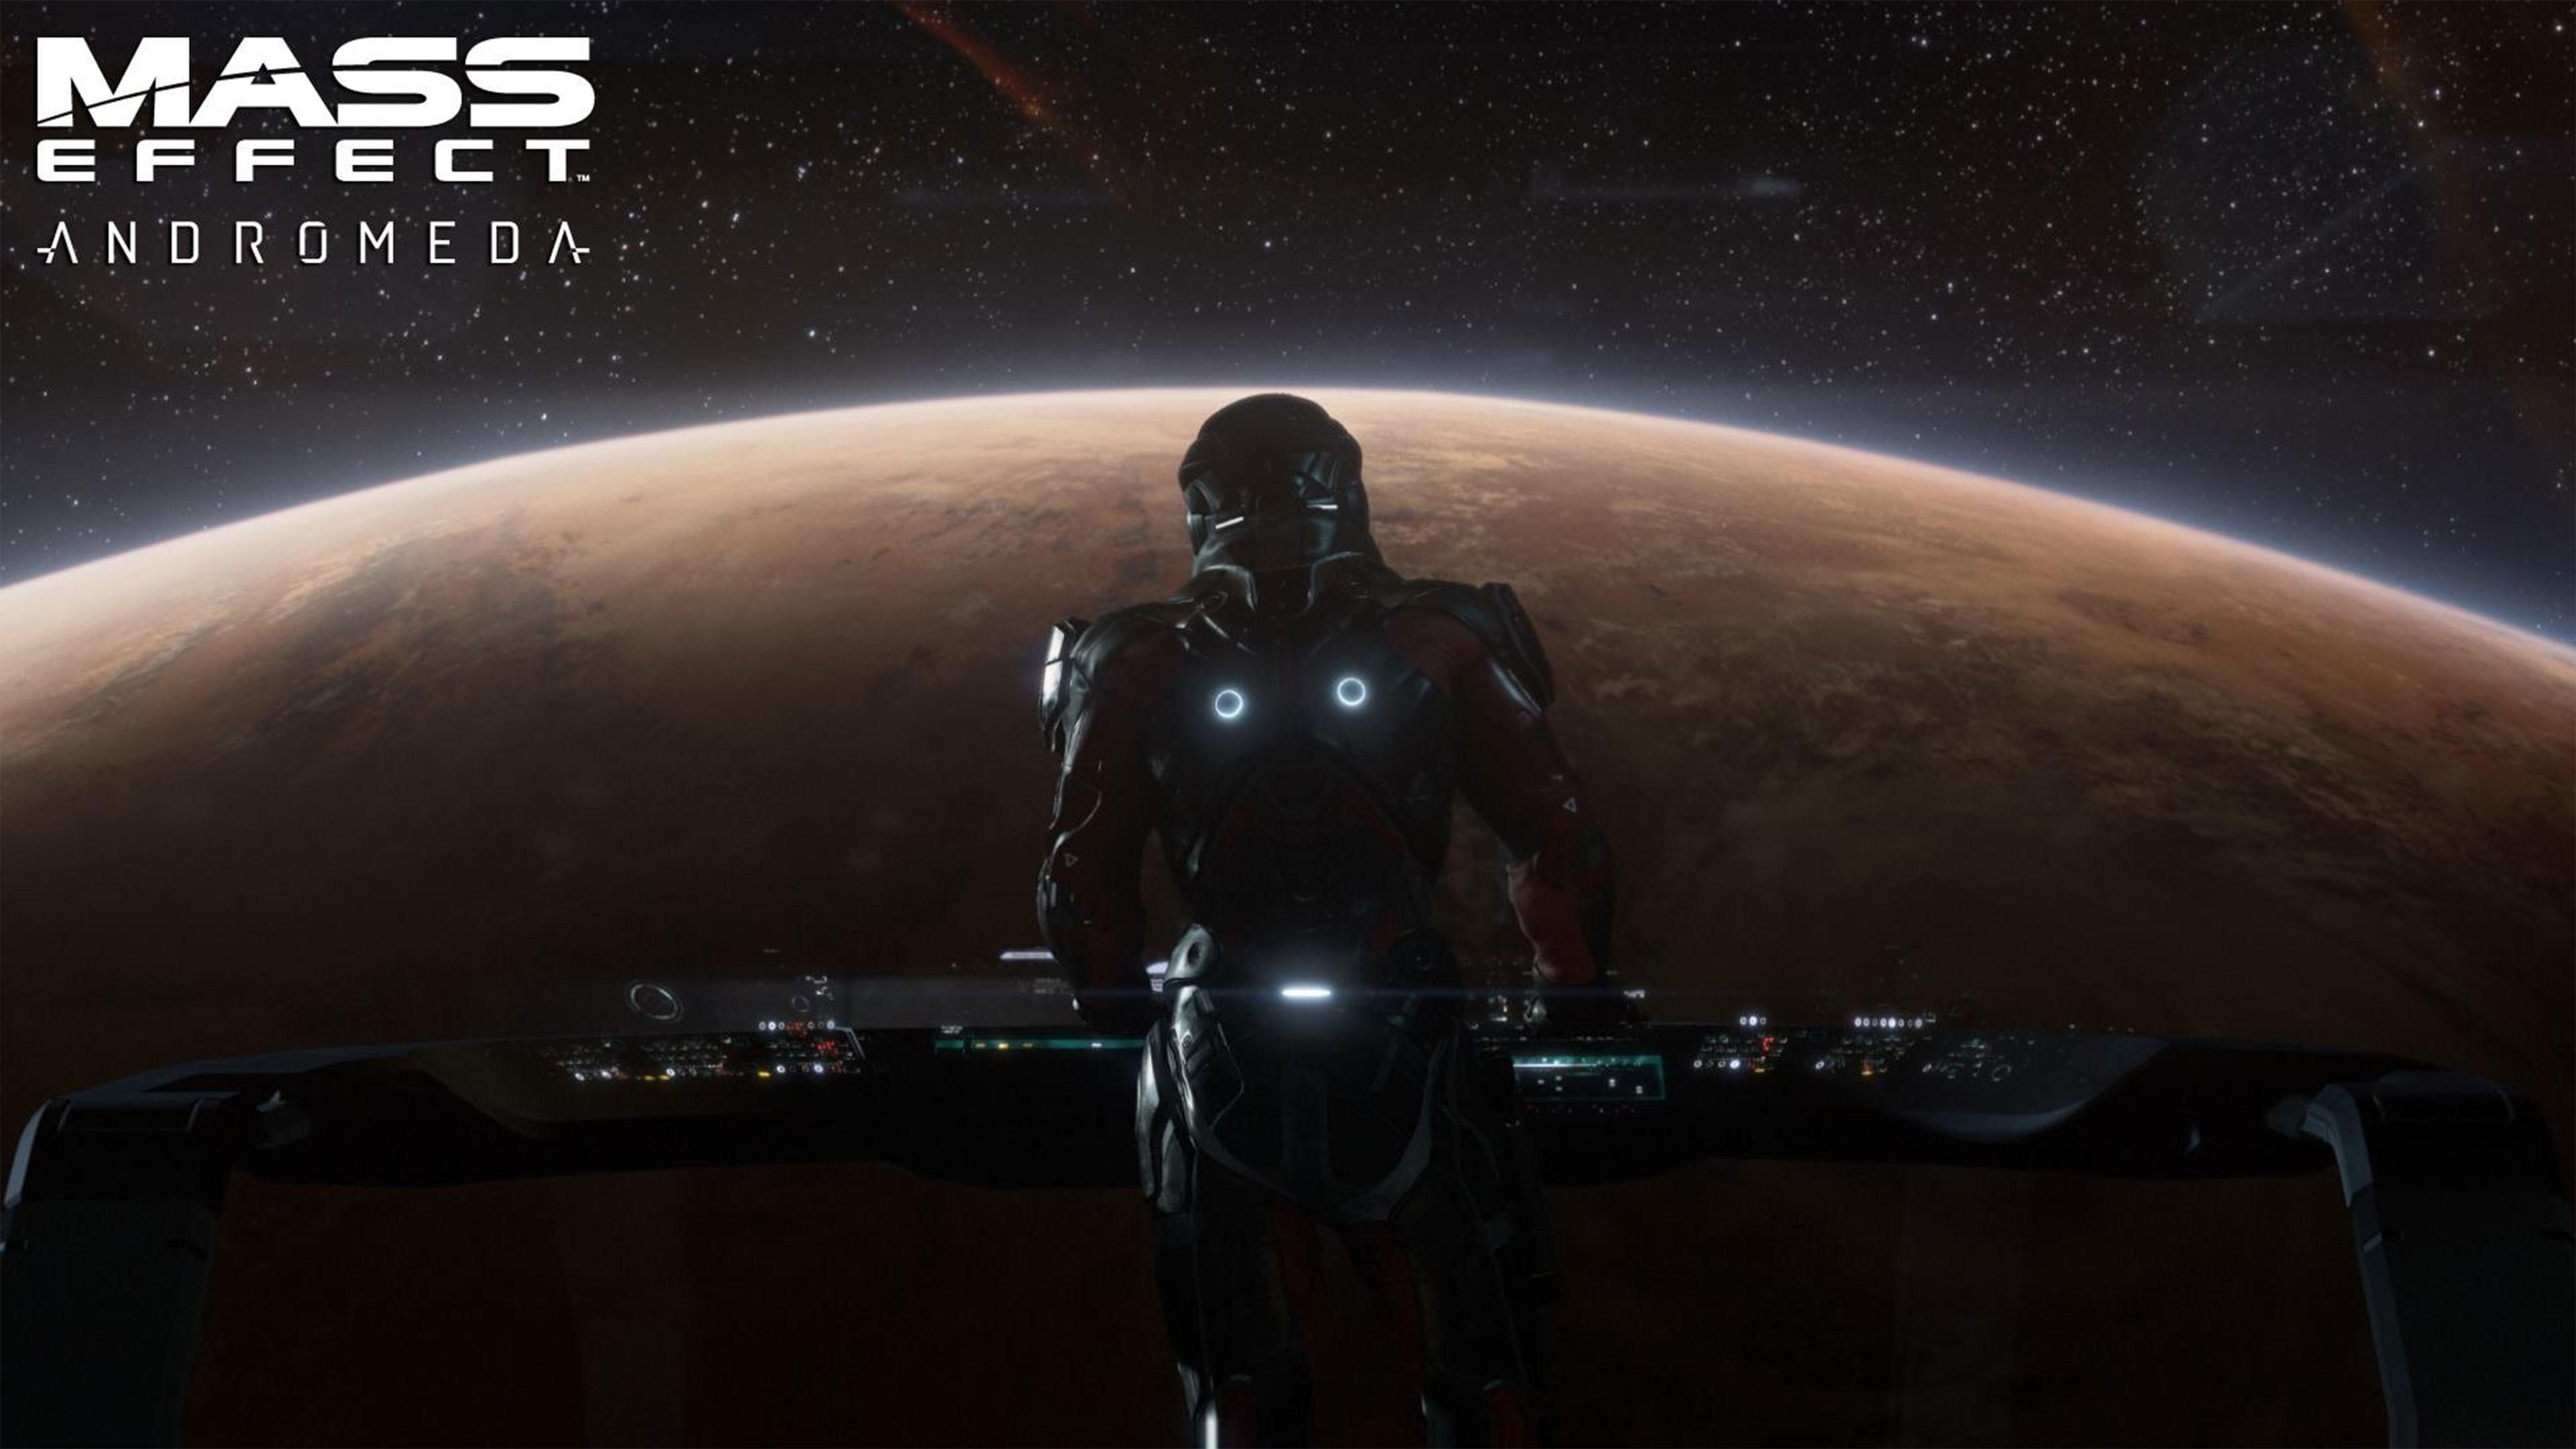 Mass Effect Andromeda 4K Wallpaper …